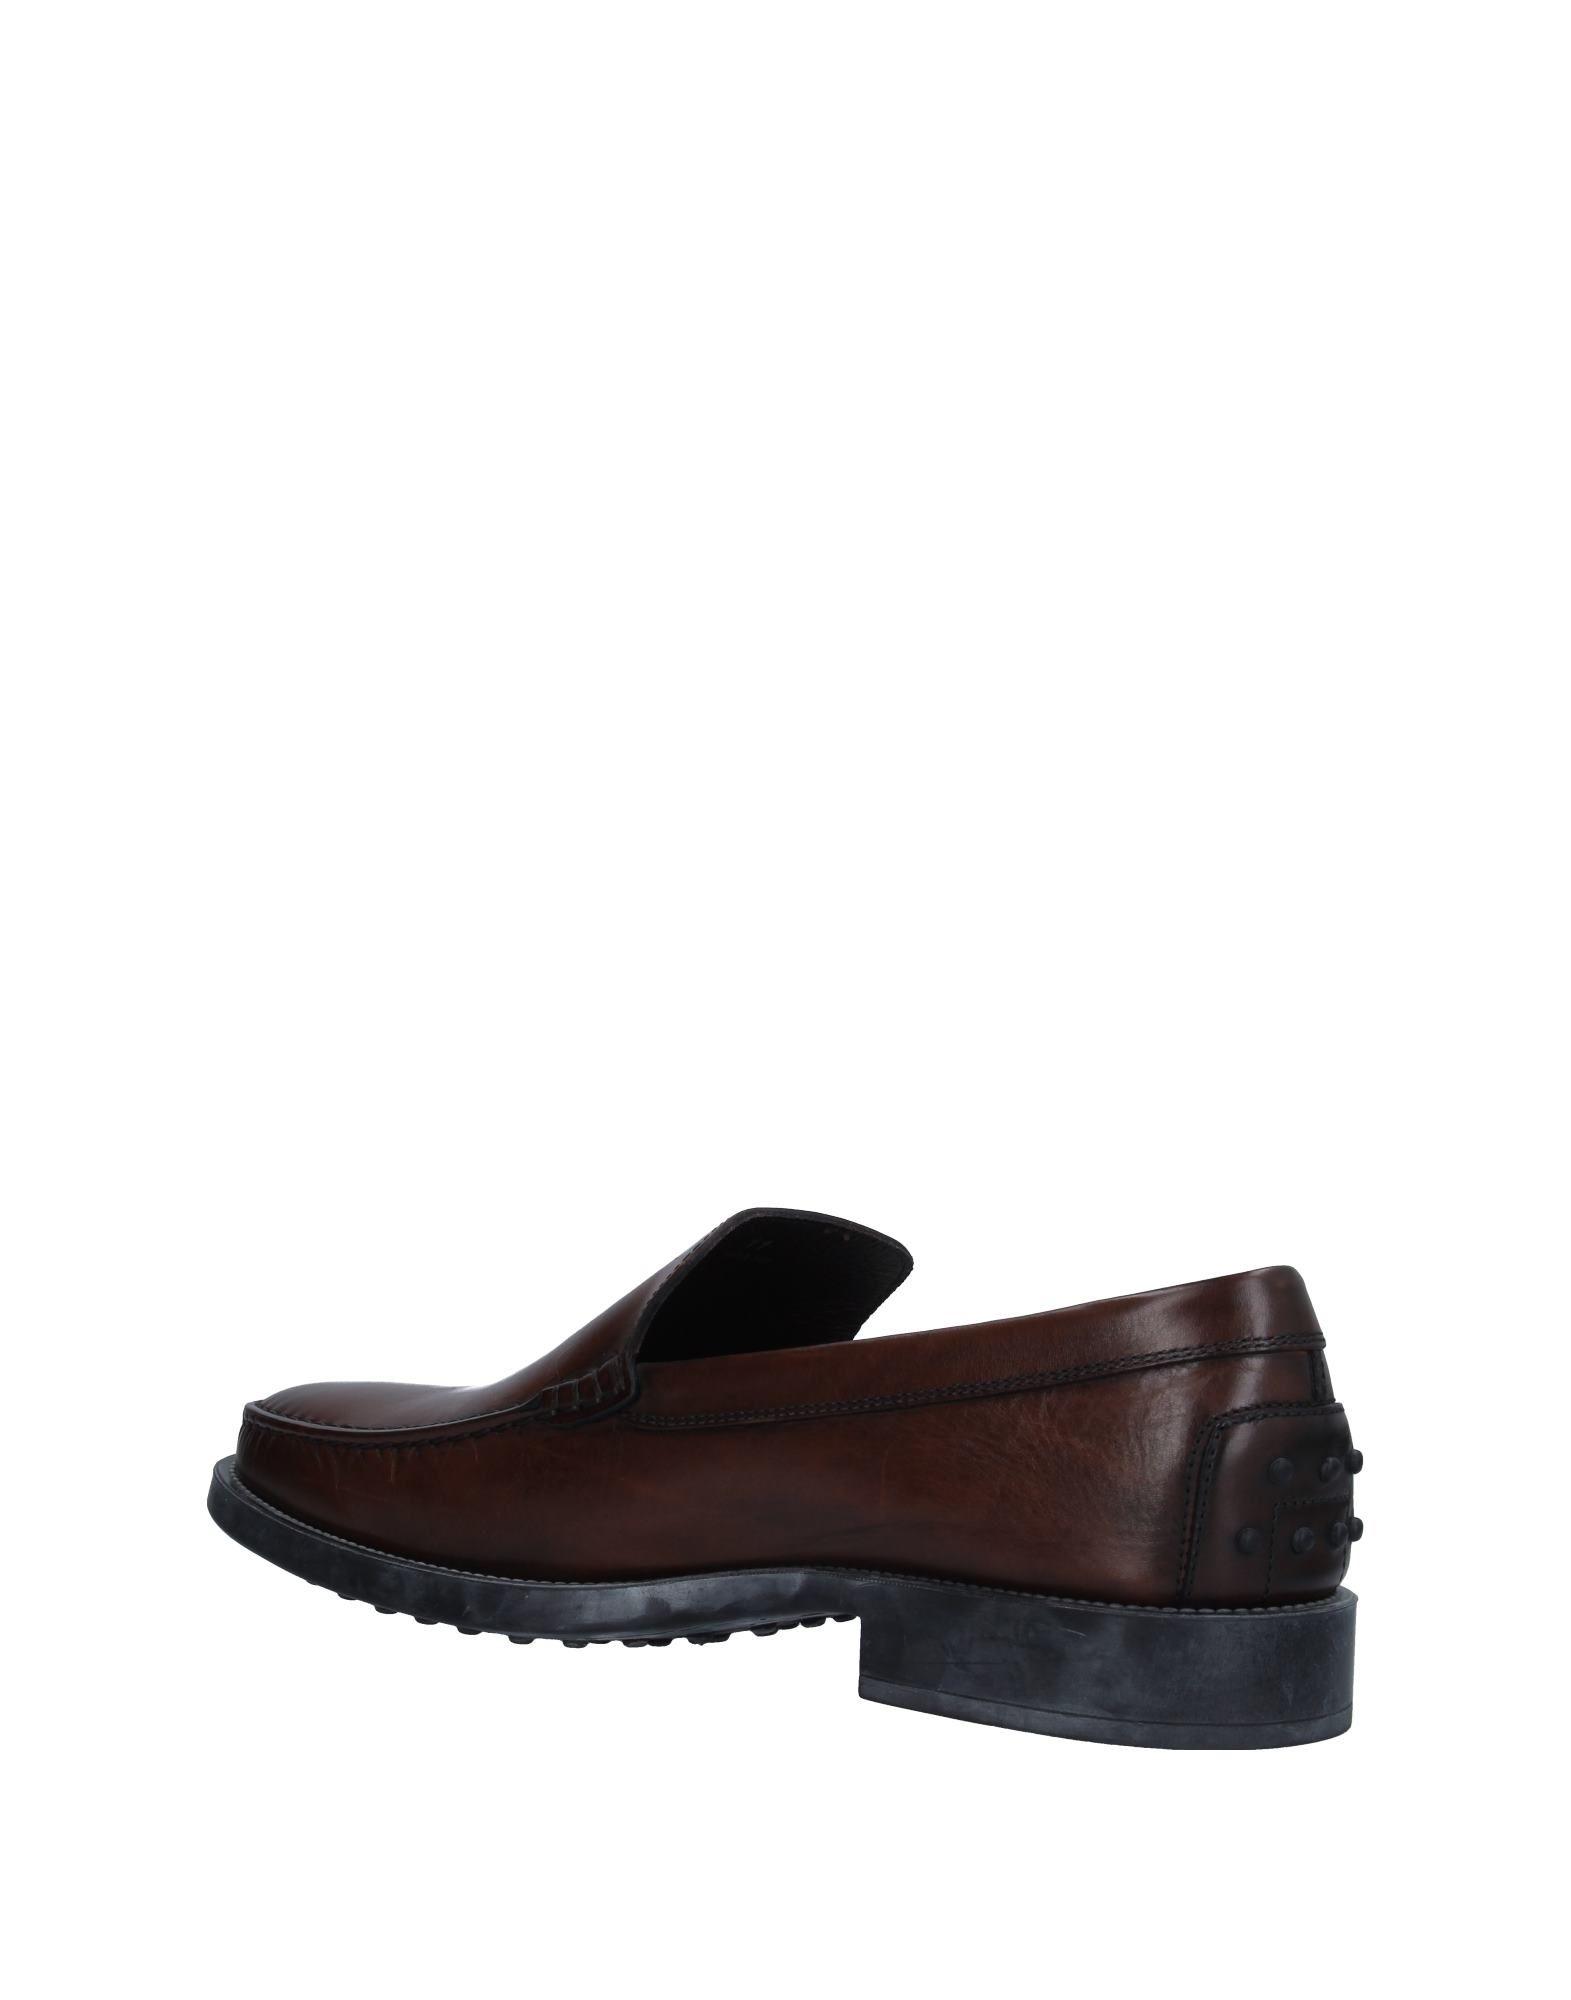 Tod's Mokassins  Herren  Mokassins 11289649NT Heiße Schuhe 112891